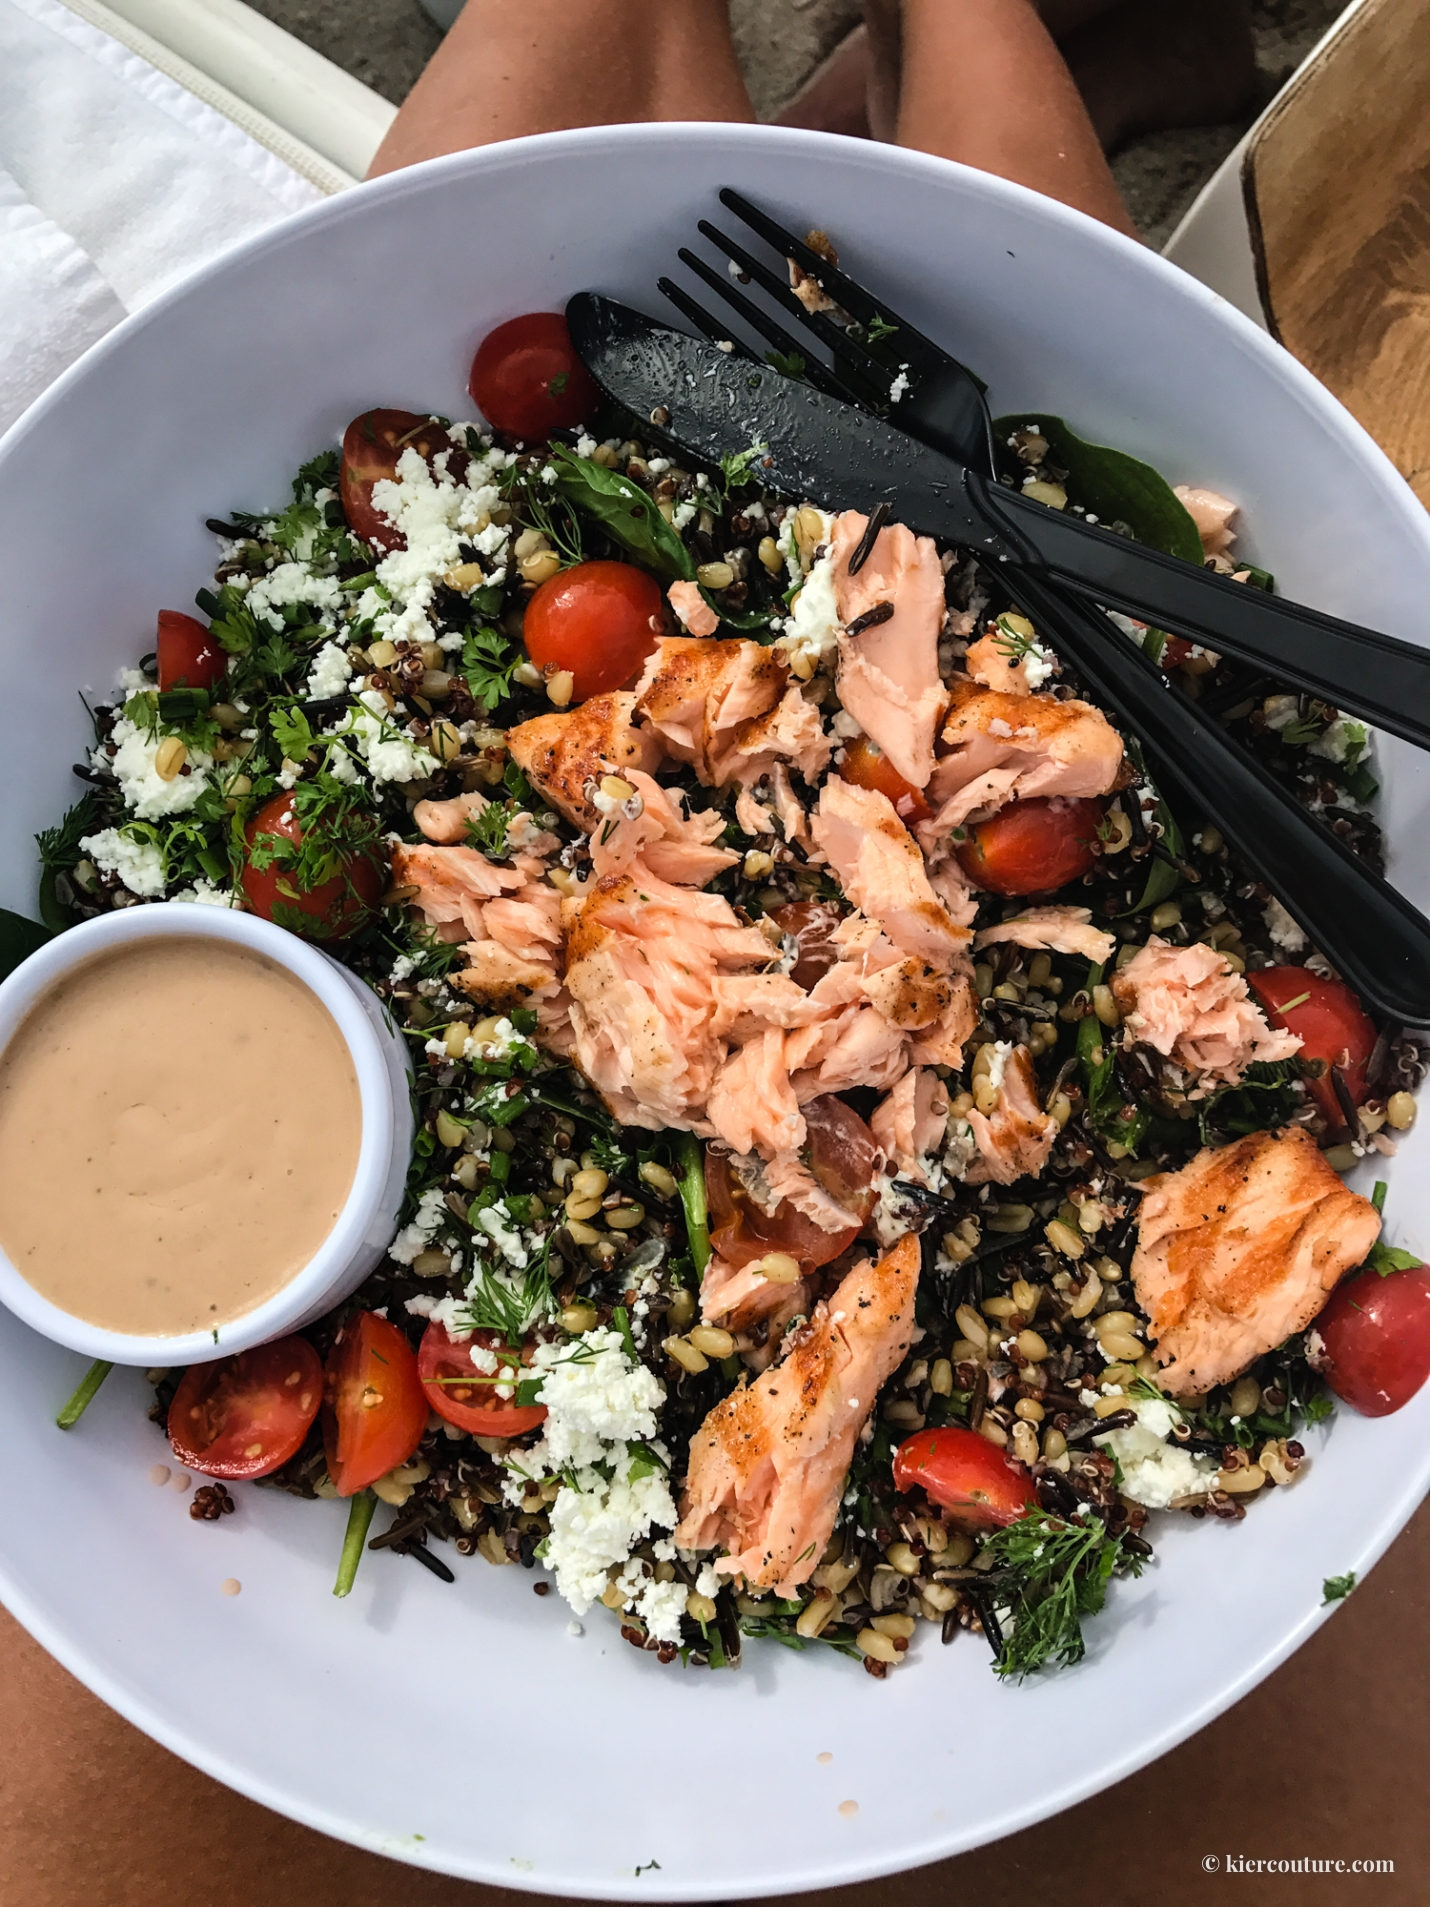 miami beach edition three grain salad